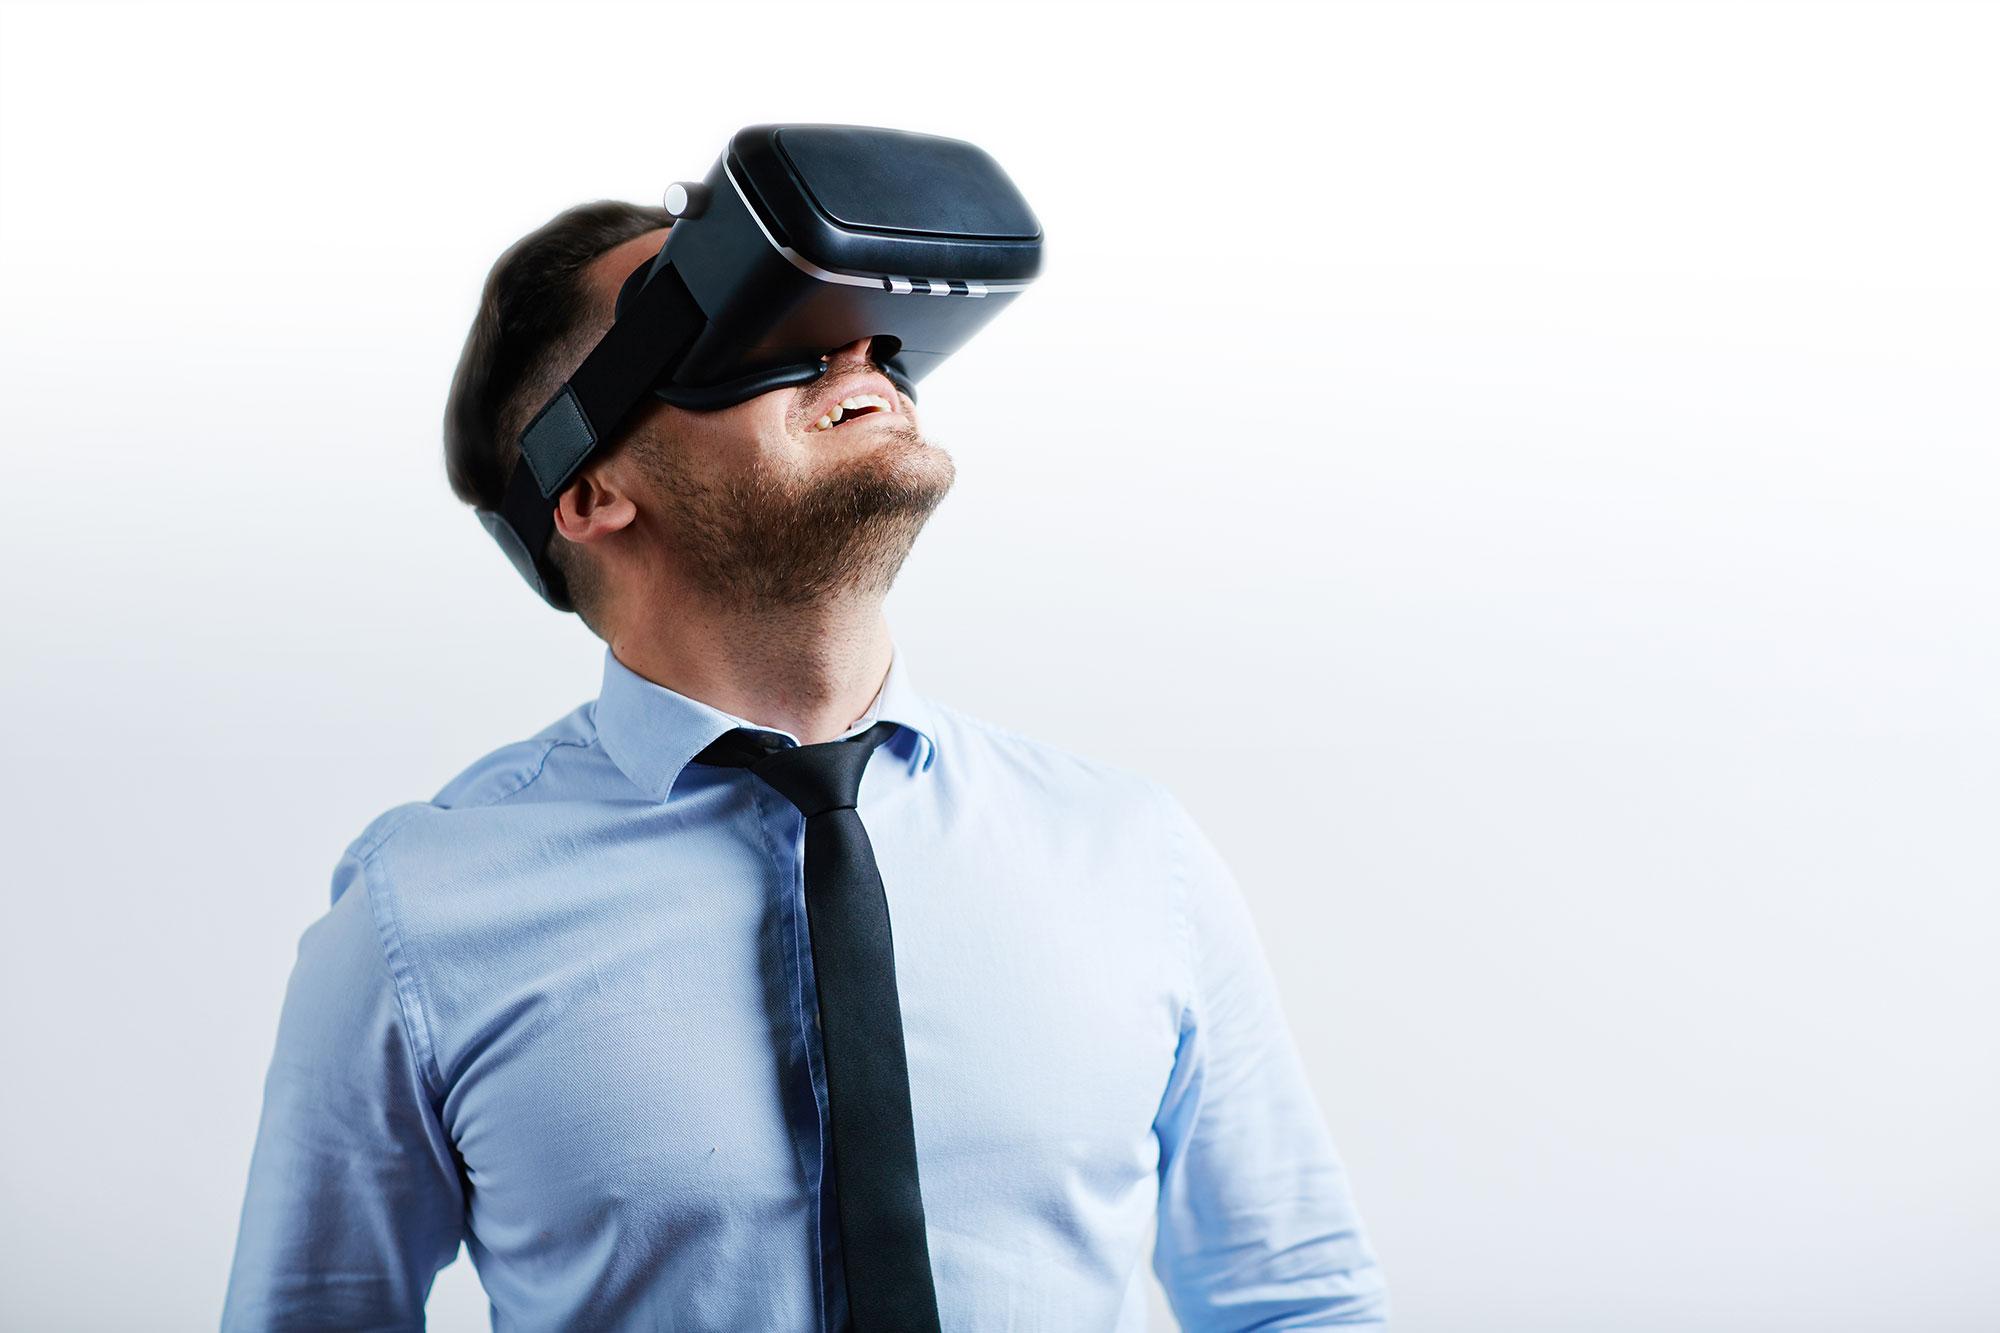 Realtà virtuale sistemi radianti